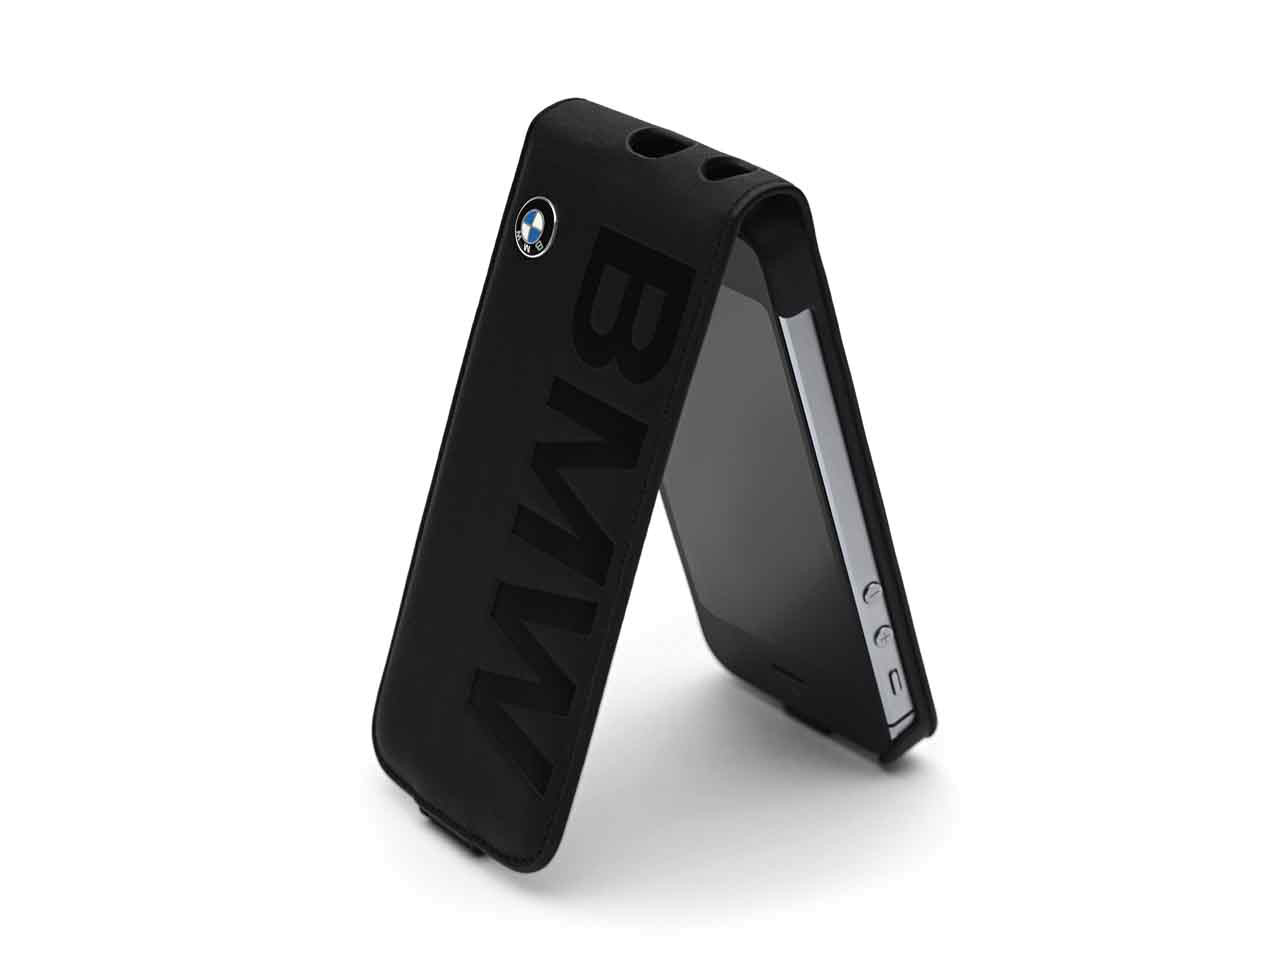 BMW Handy-Klapphülle Samsung Galaxy S4 mini, schwarz